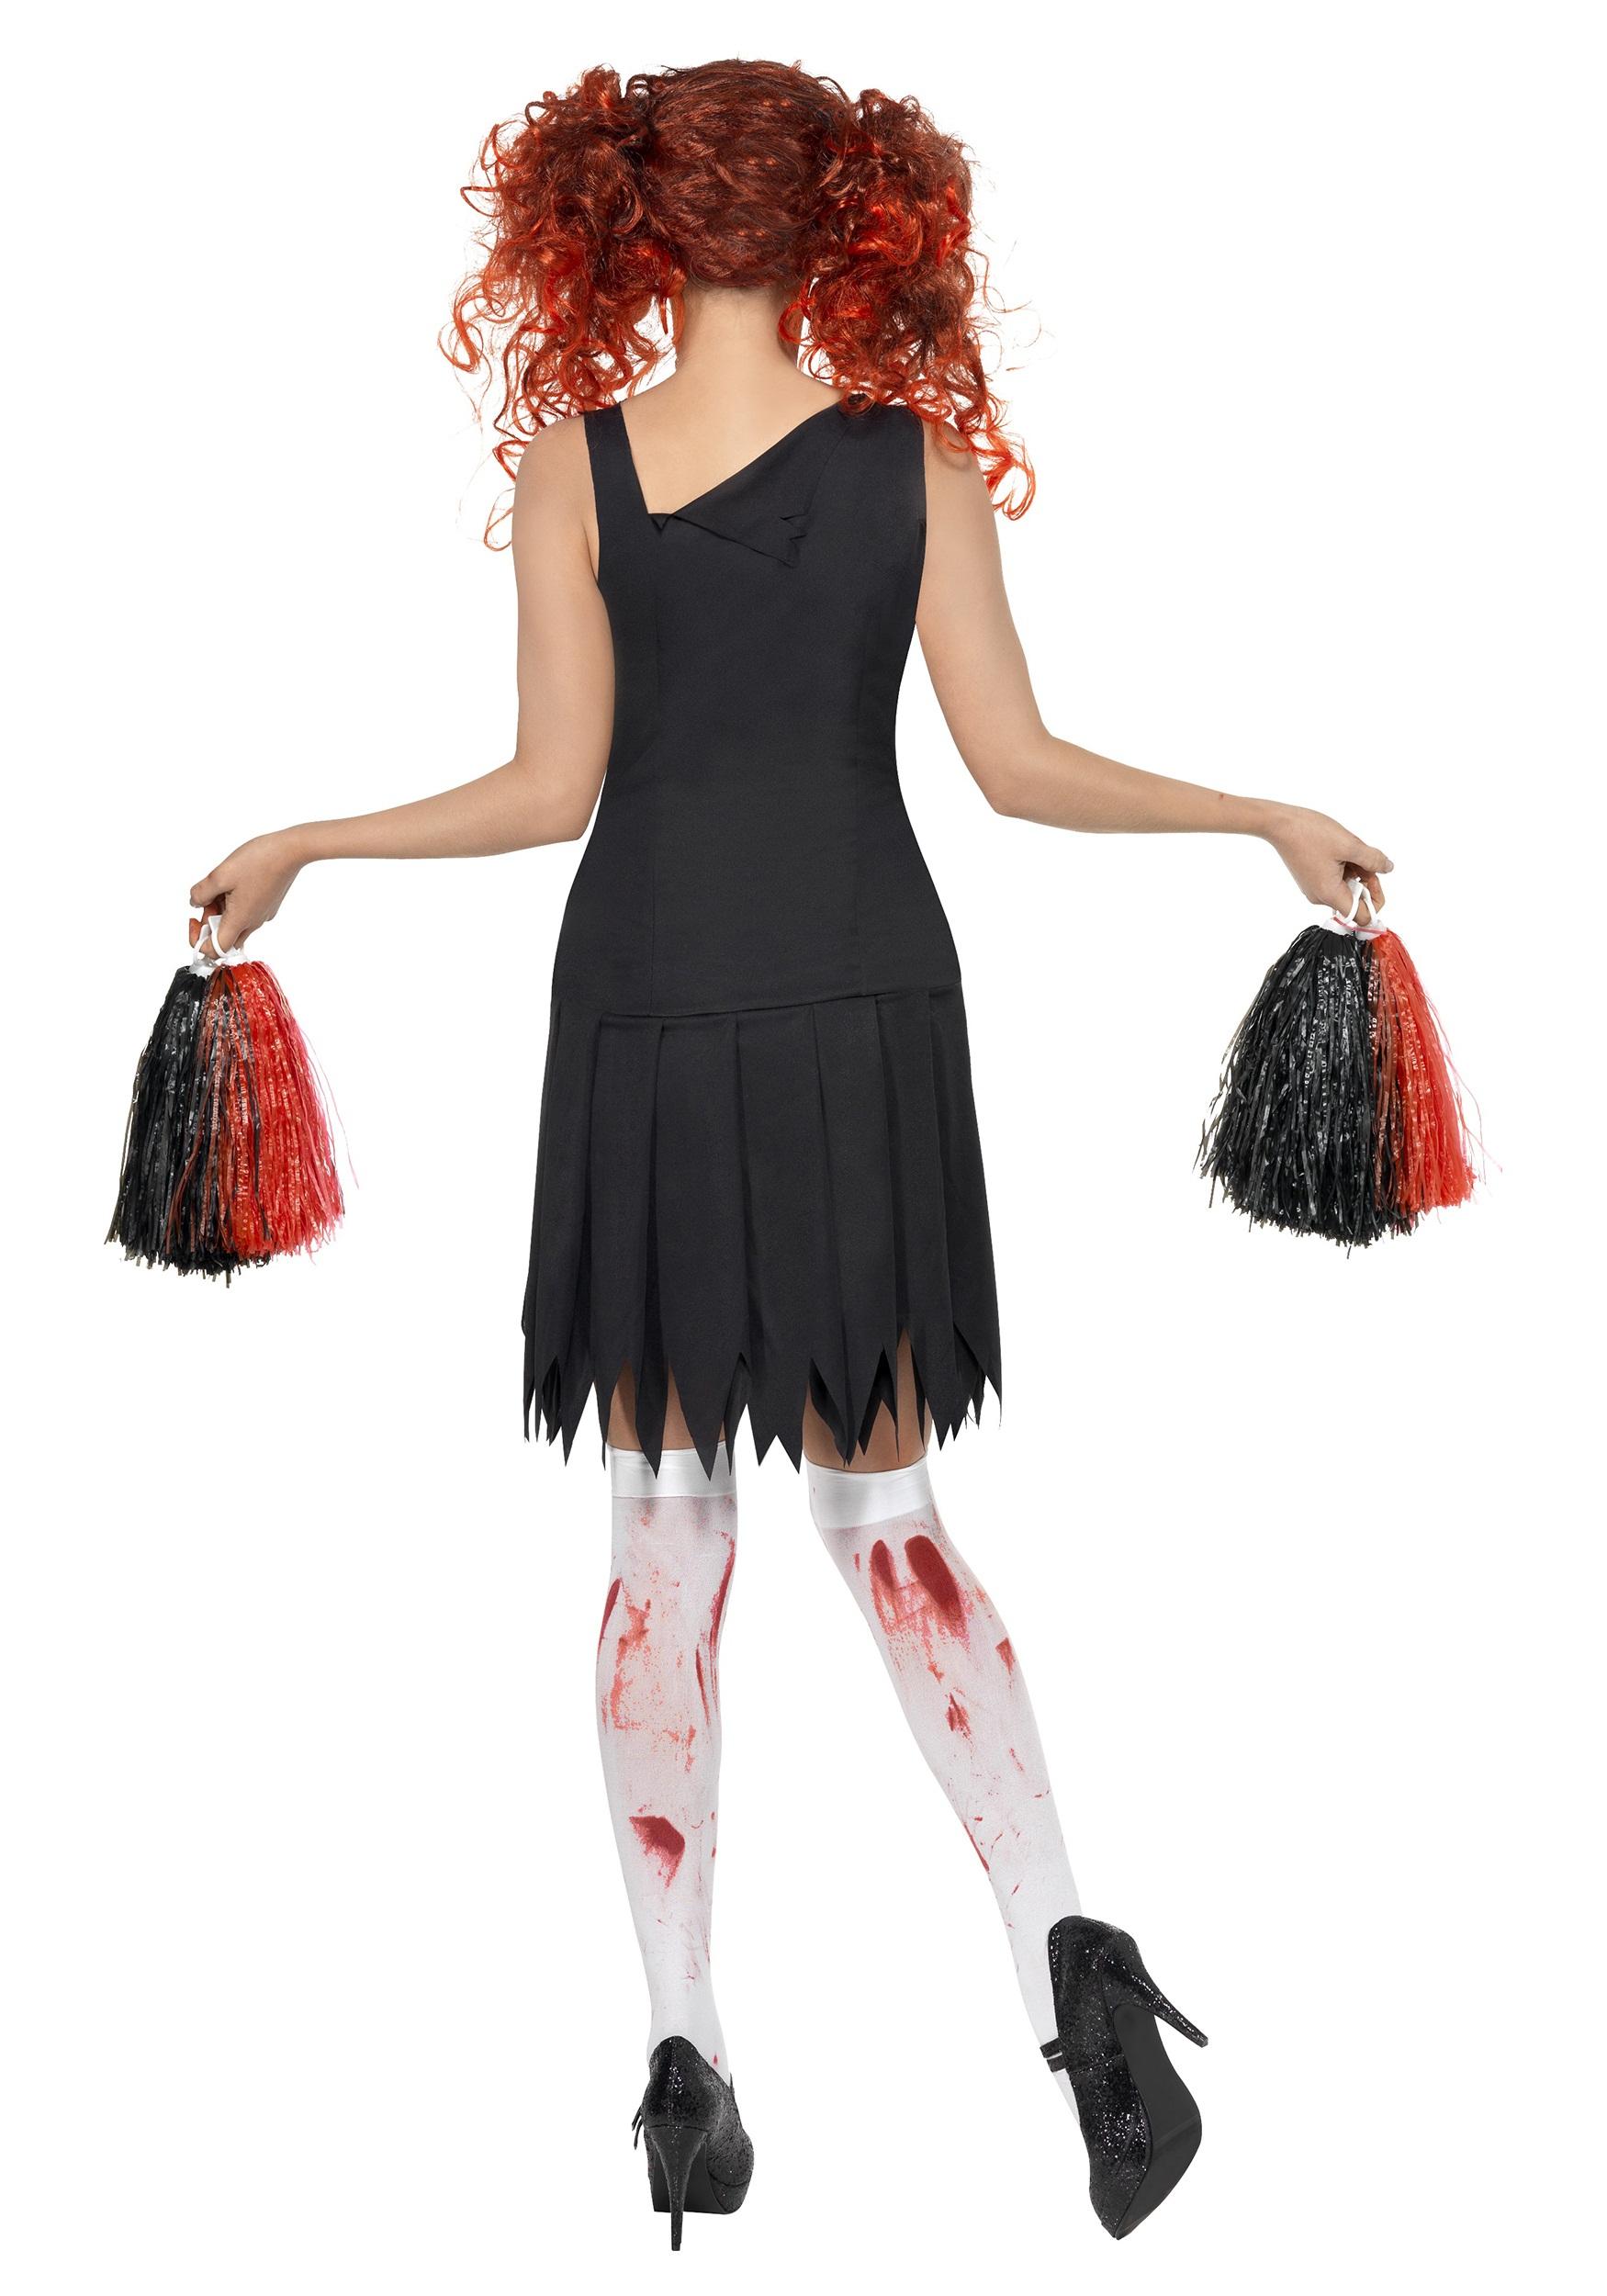 Zombie cheerleader costume zombie cheerleader costume zombie cheerleader costume alt1 solutioingenieria Gallery